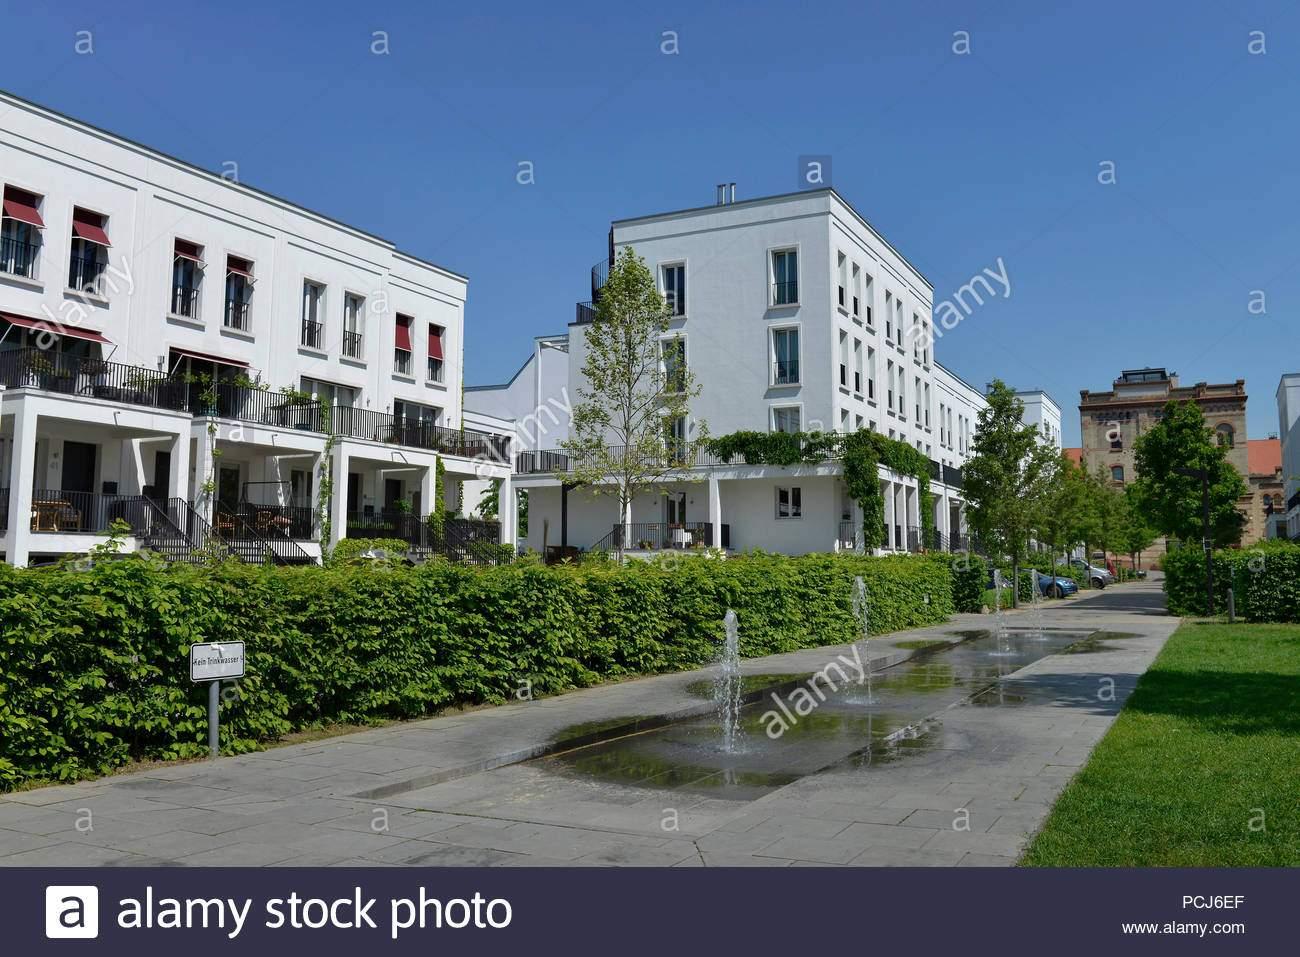 Schweizer Garten Inspirierend Neubausiedlung Am Schweizer Garten Prenzlauer Berg Pankow